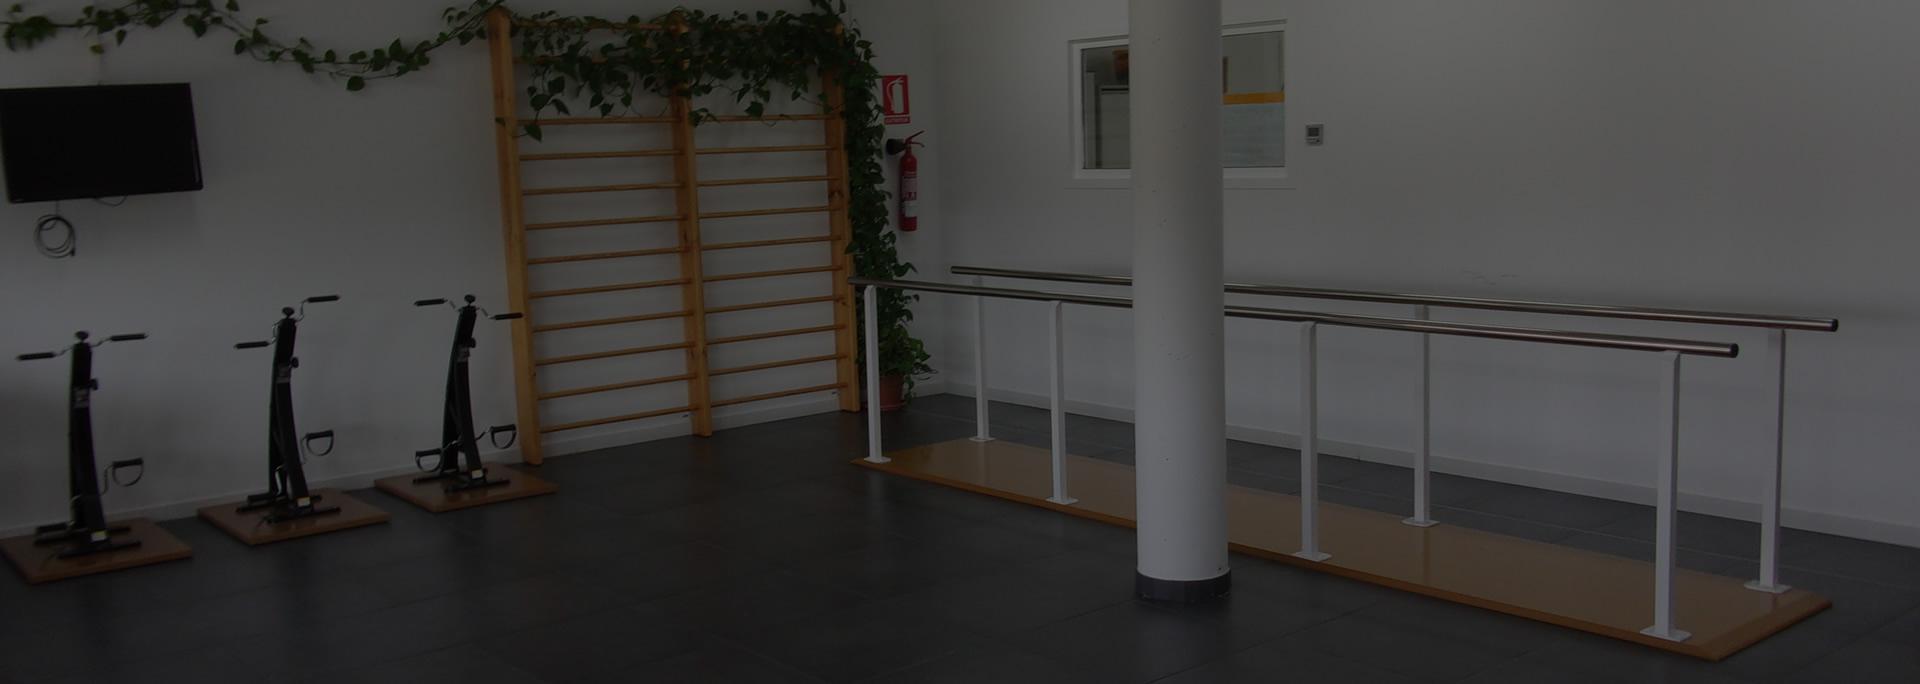 Programa de fisioterapia